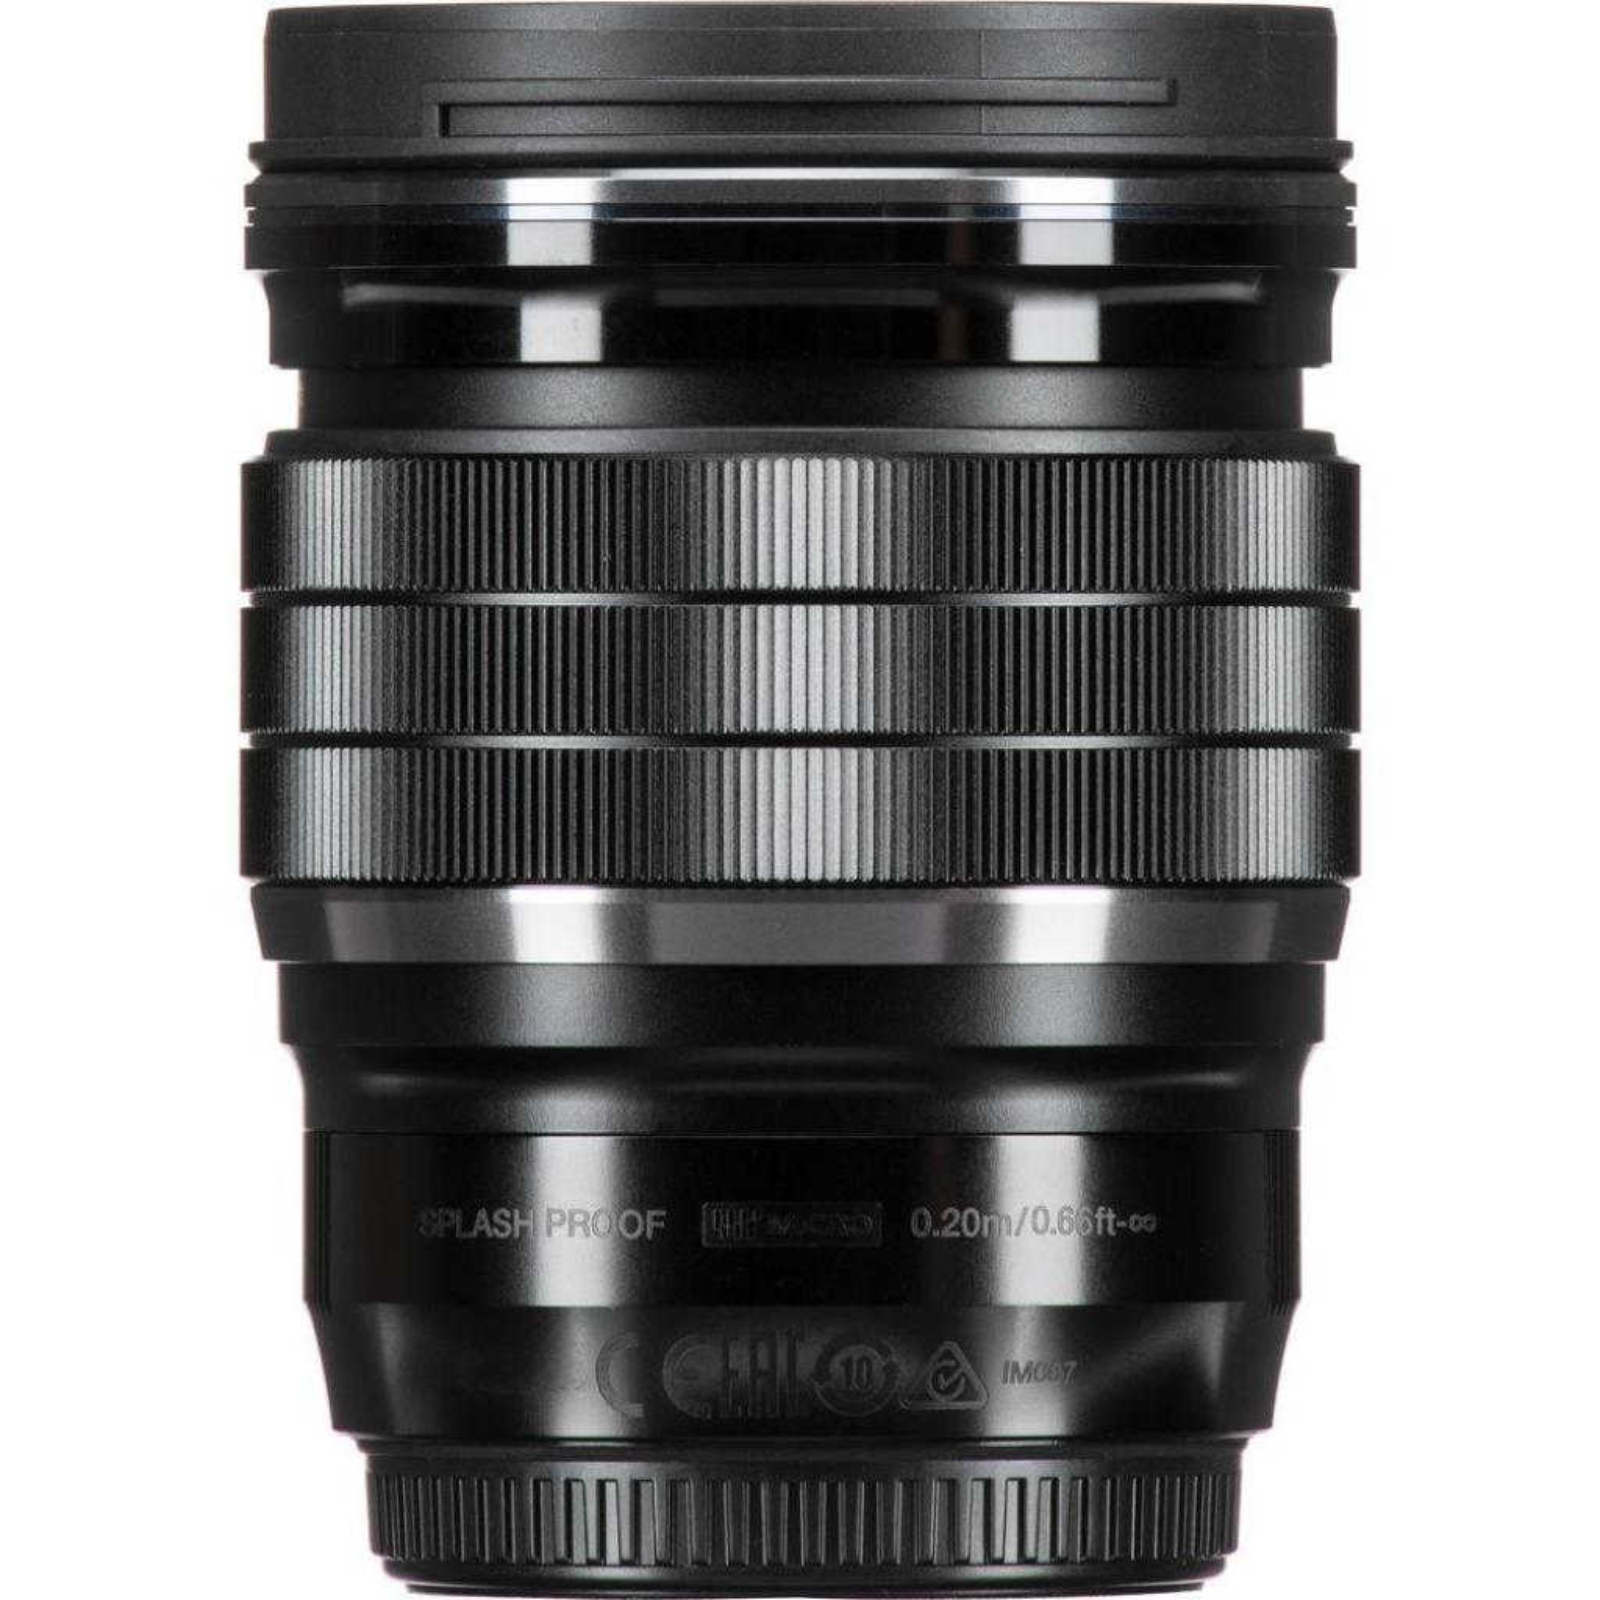 Объектив OLYMPUS EW-M1712 17mm 1:1.2 PRO Black (V311100BW000) изображение 9